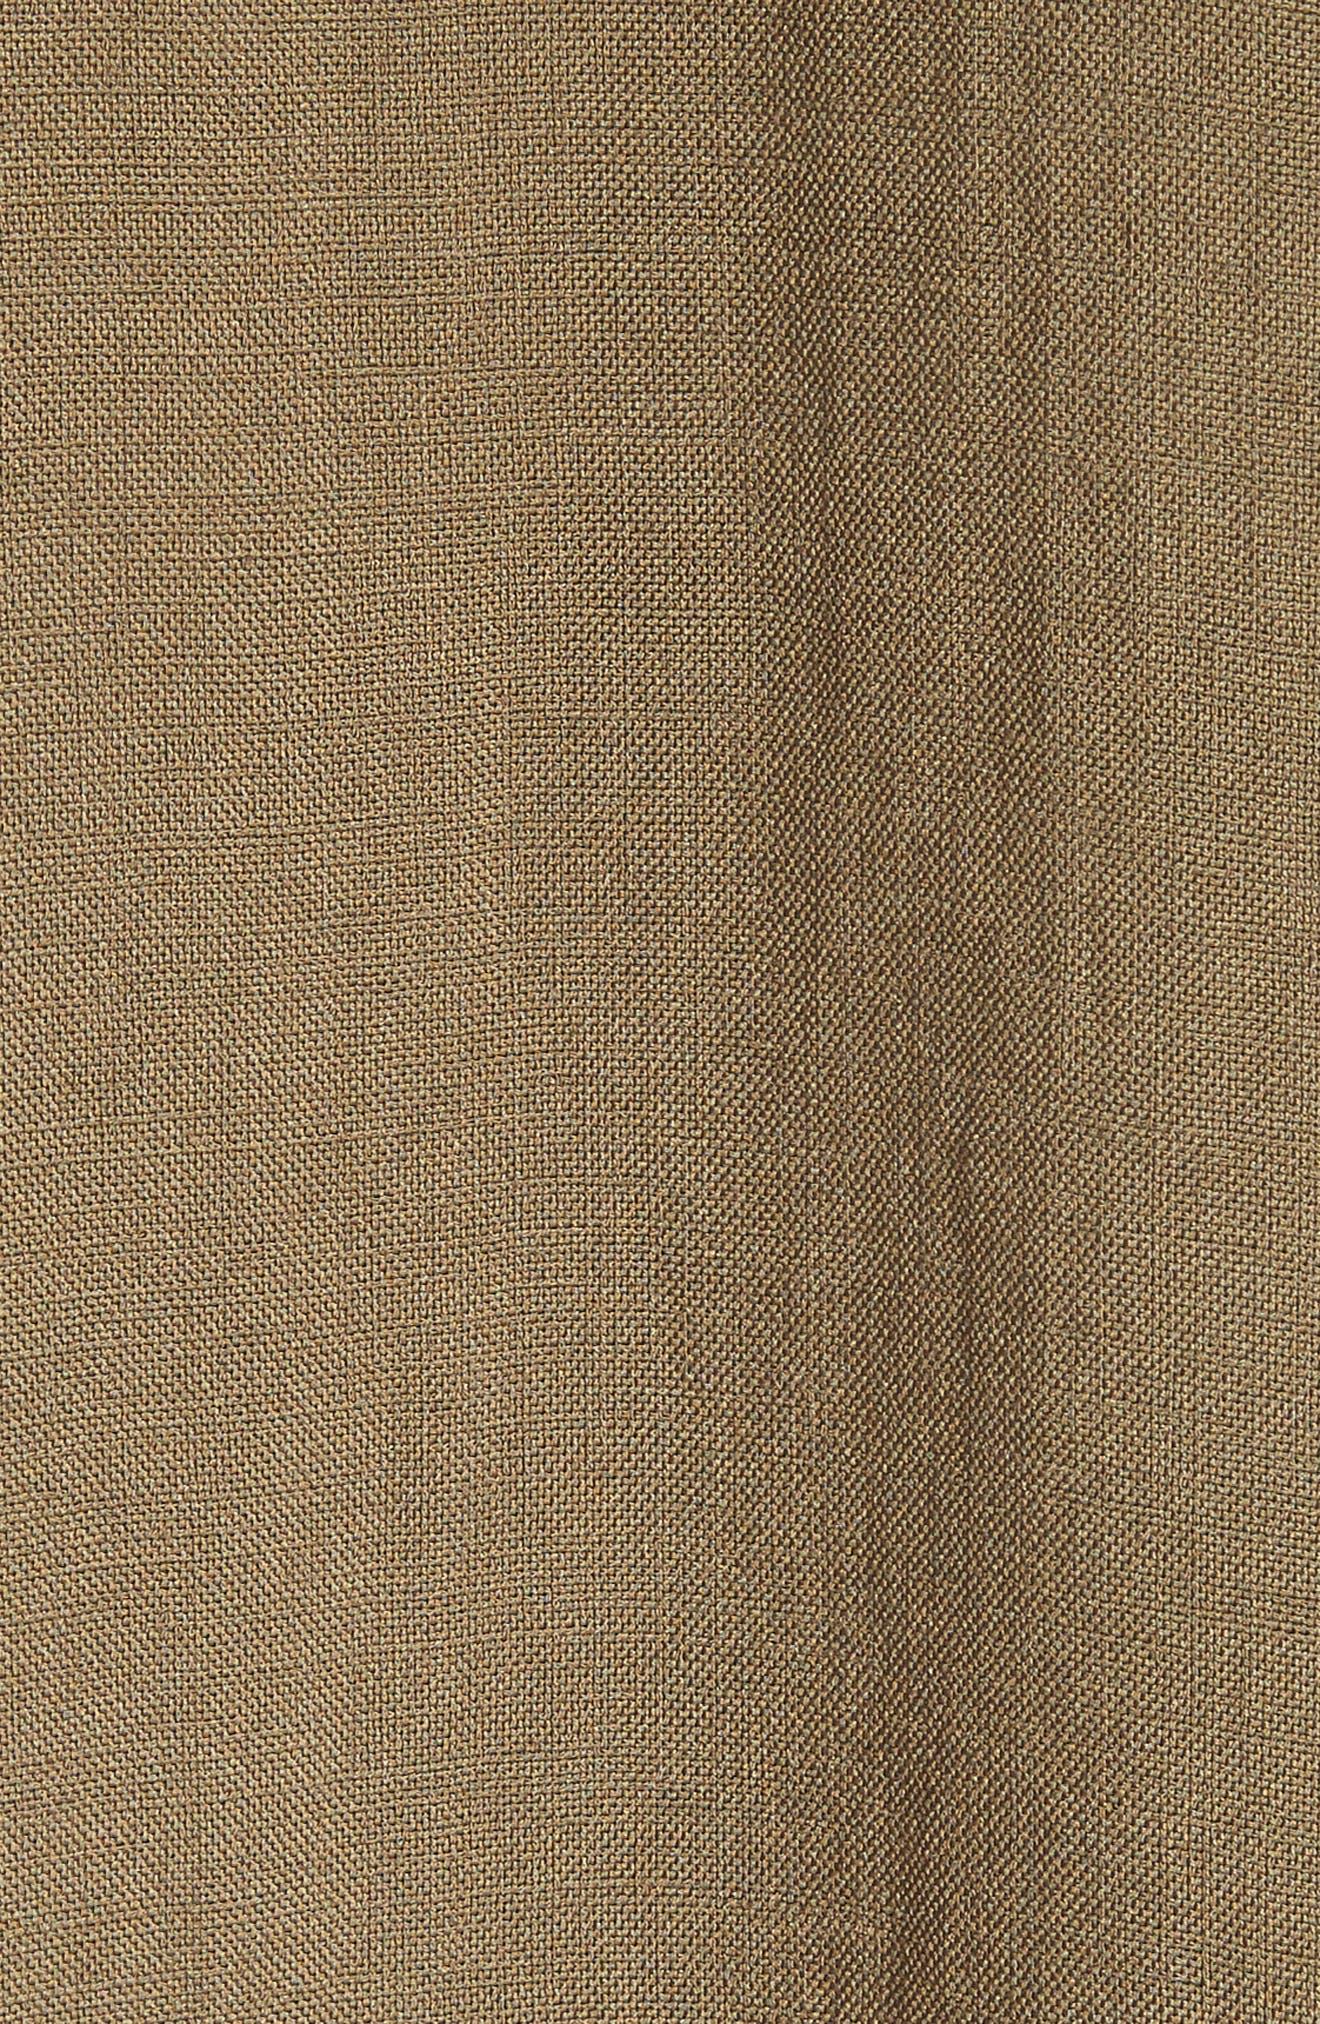 Grant Altruistic Cloth Jacket,                             Alternate thumbnail 6, color,                             342